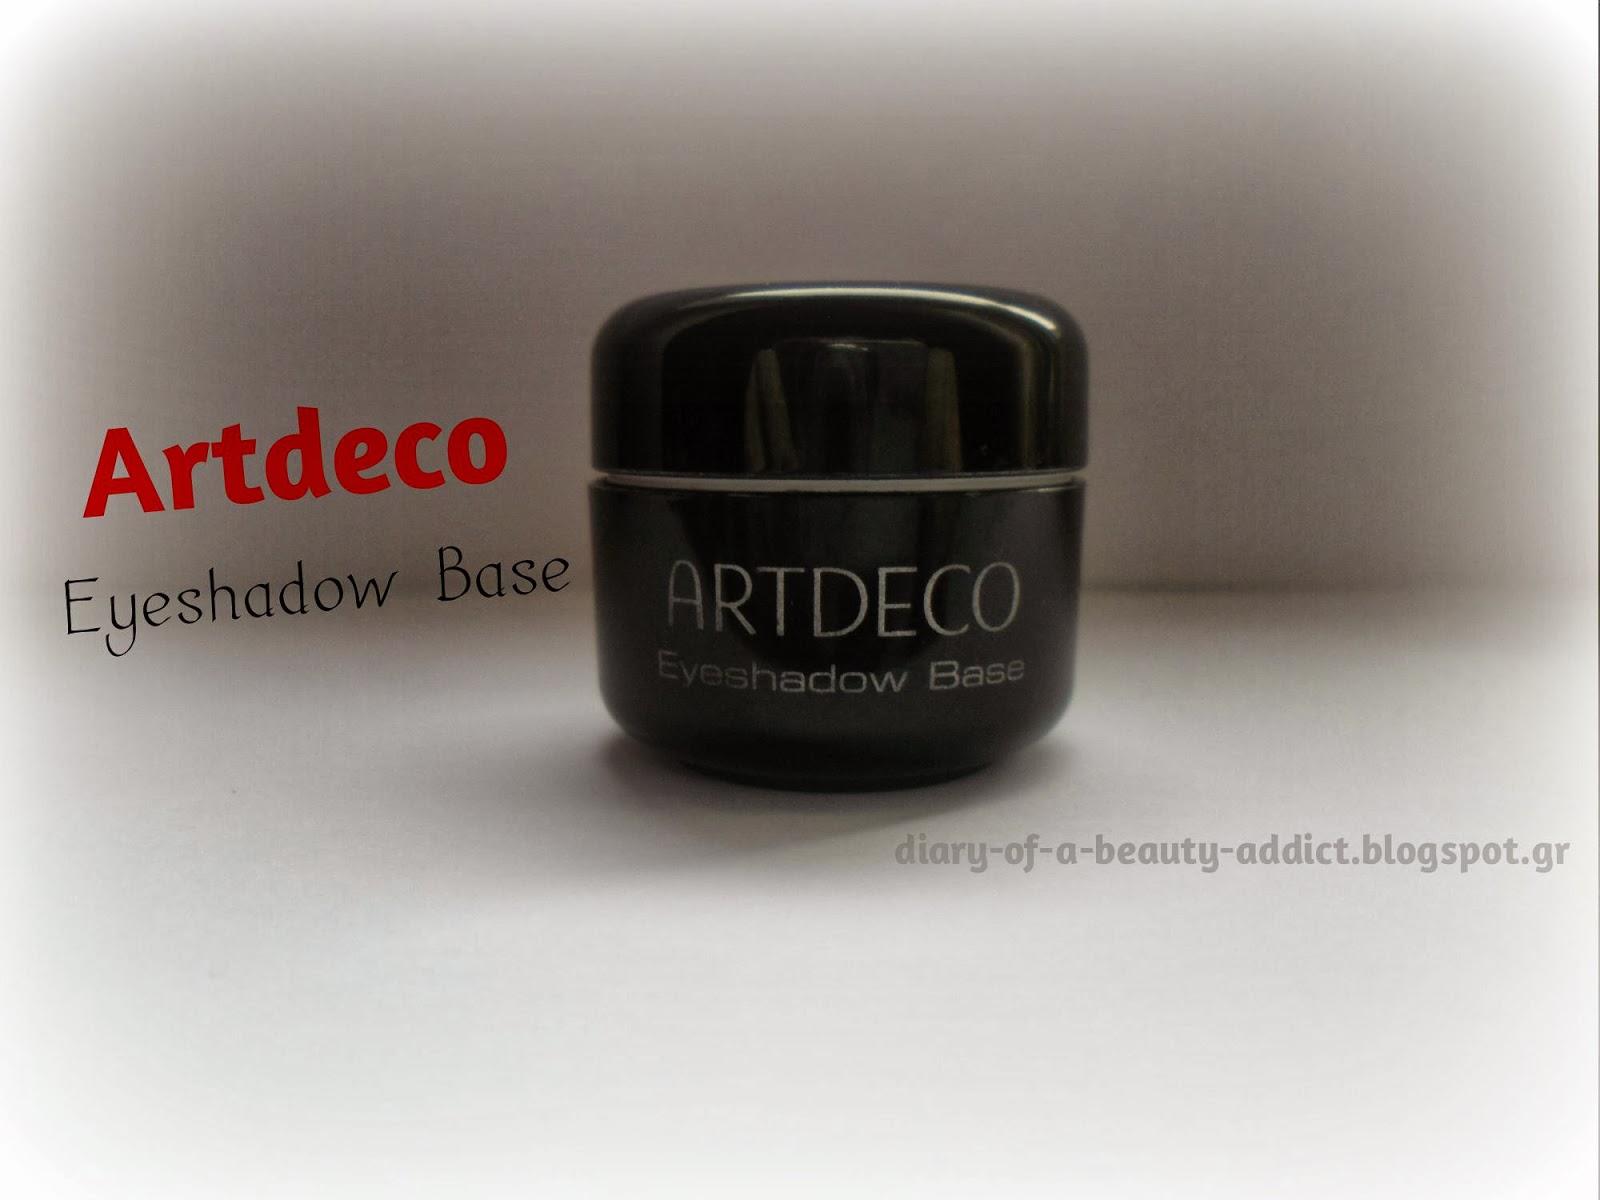 ARTDECO Εyeshadow Βase : Review